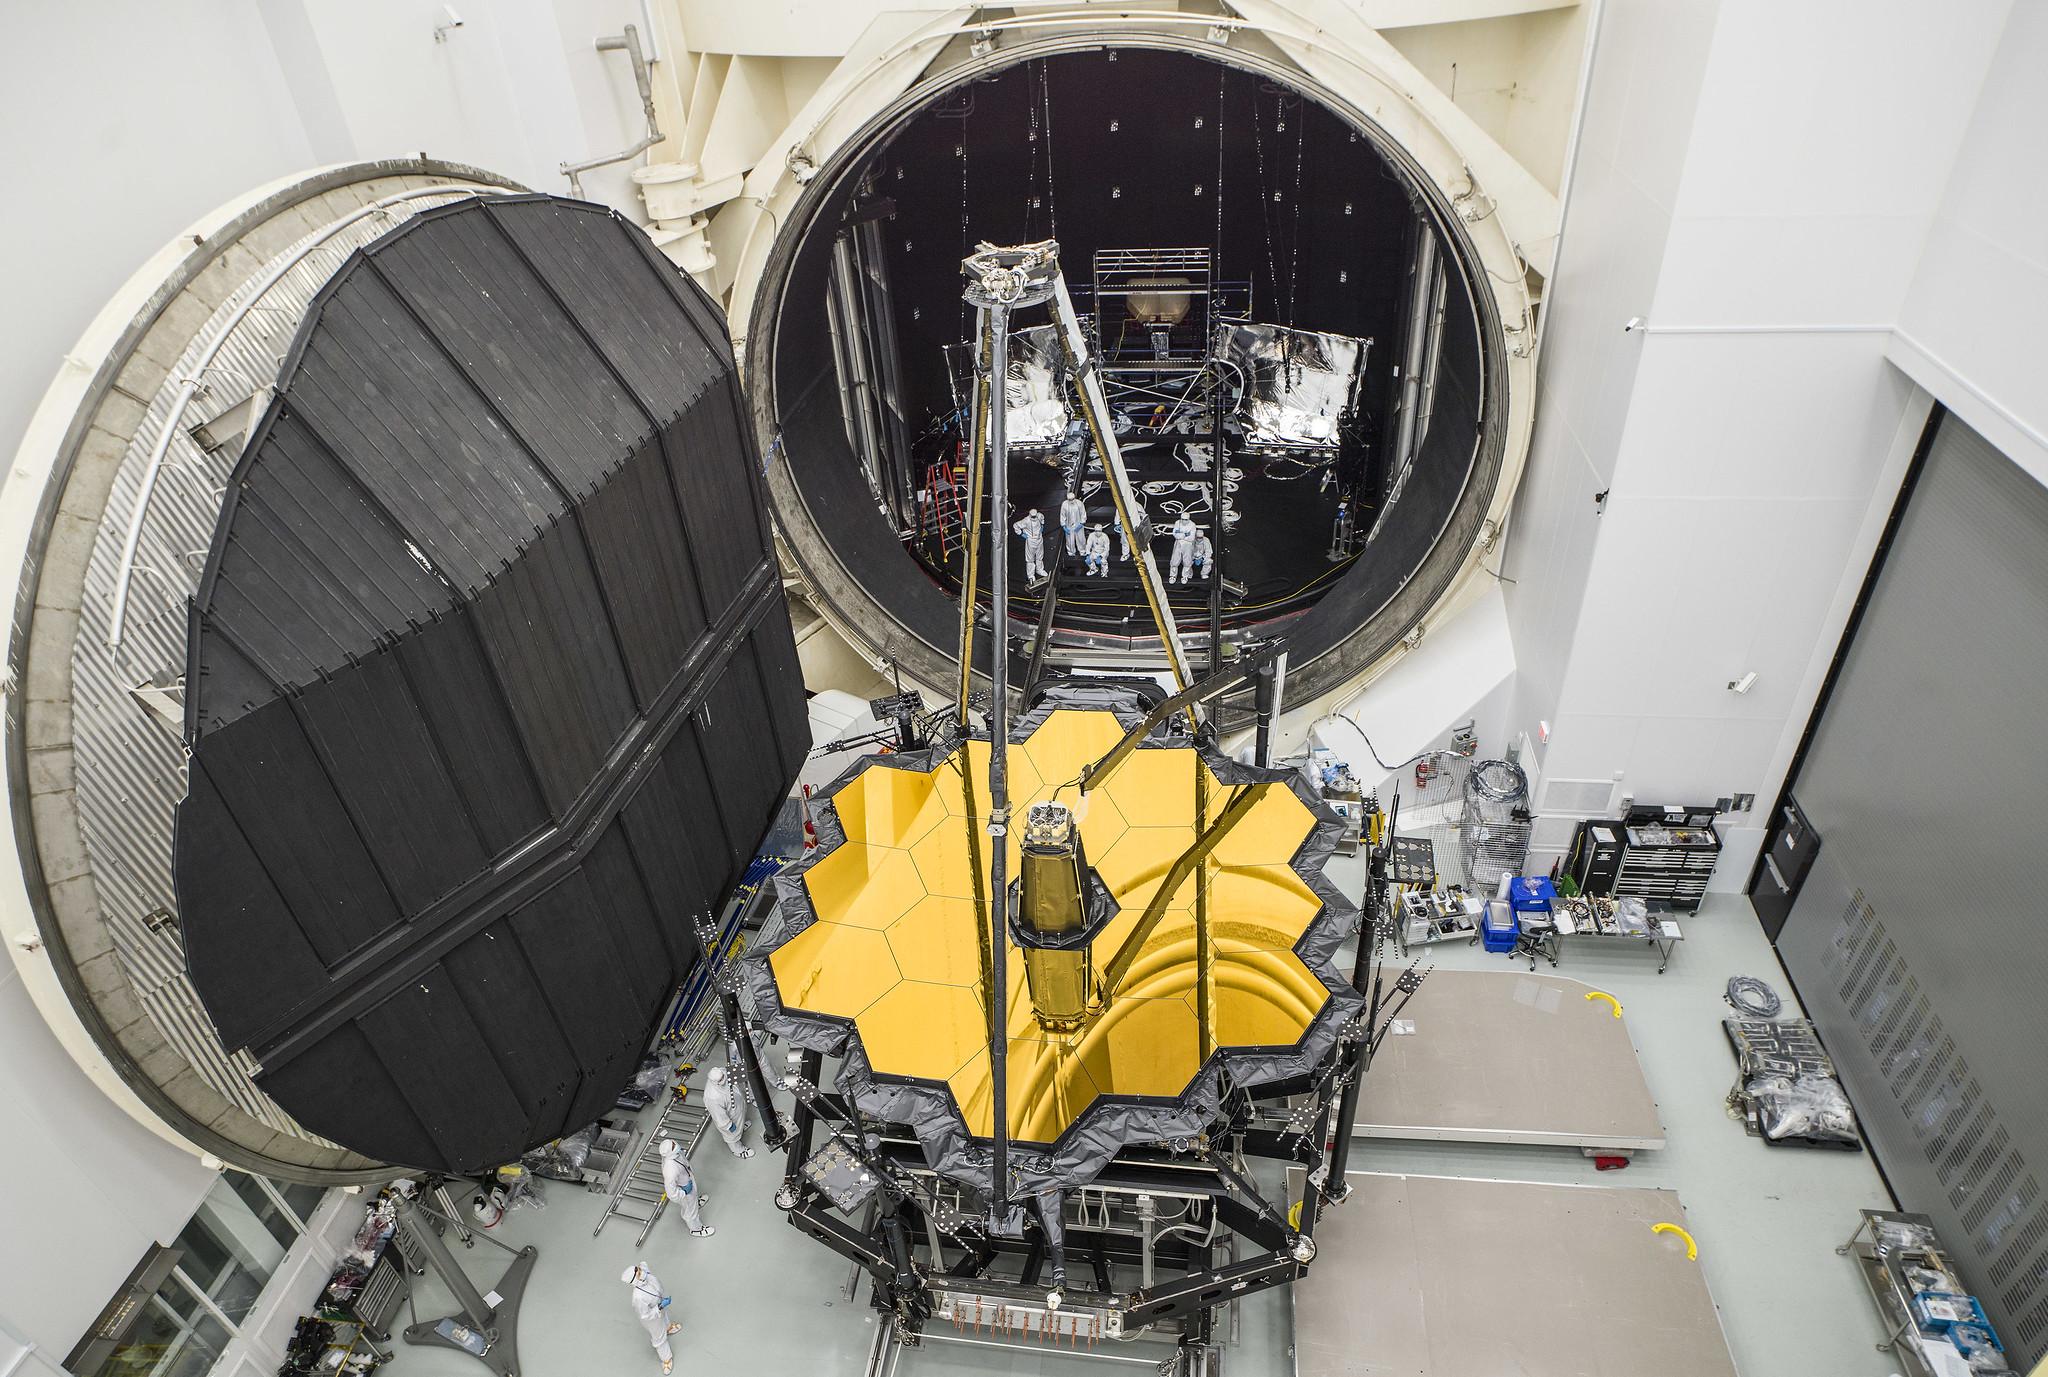 Backplane Webb/NASA